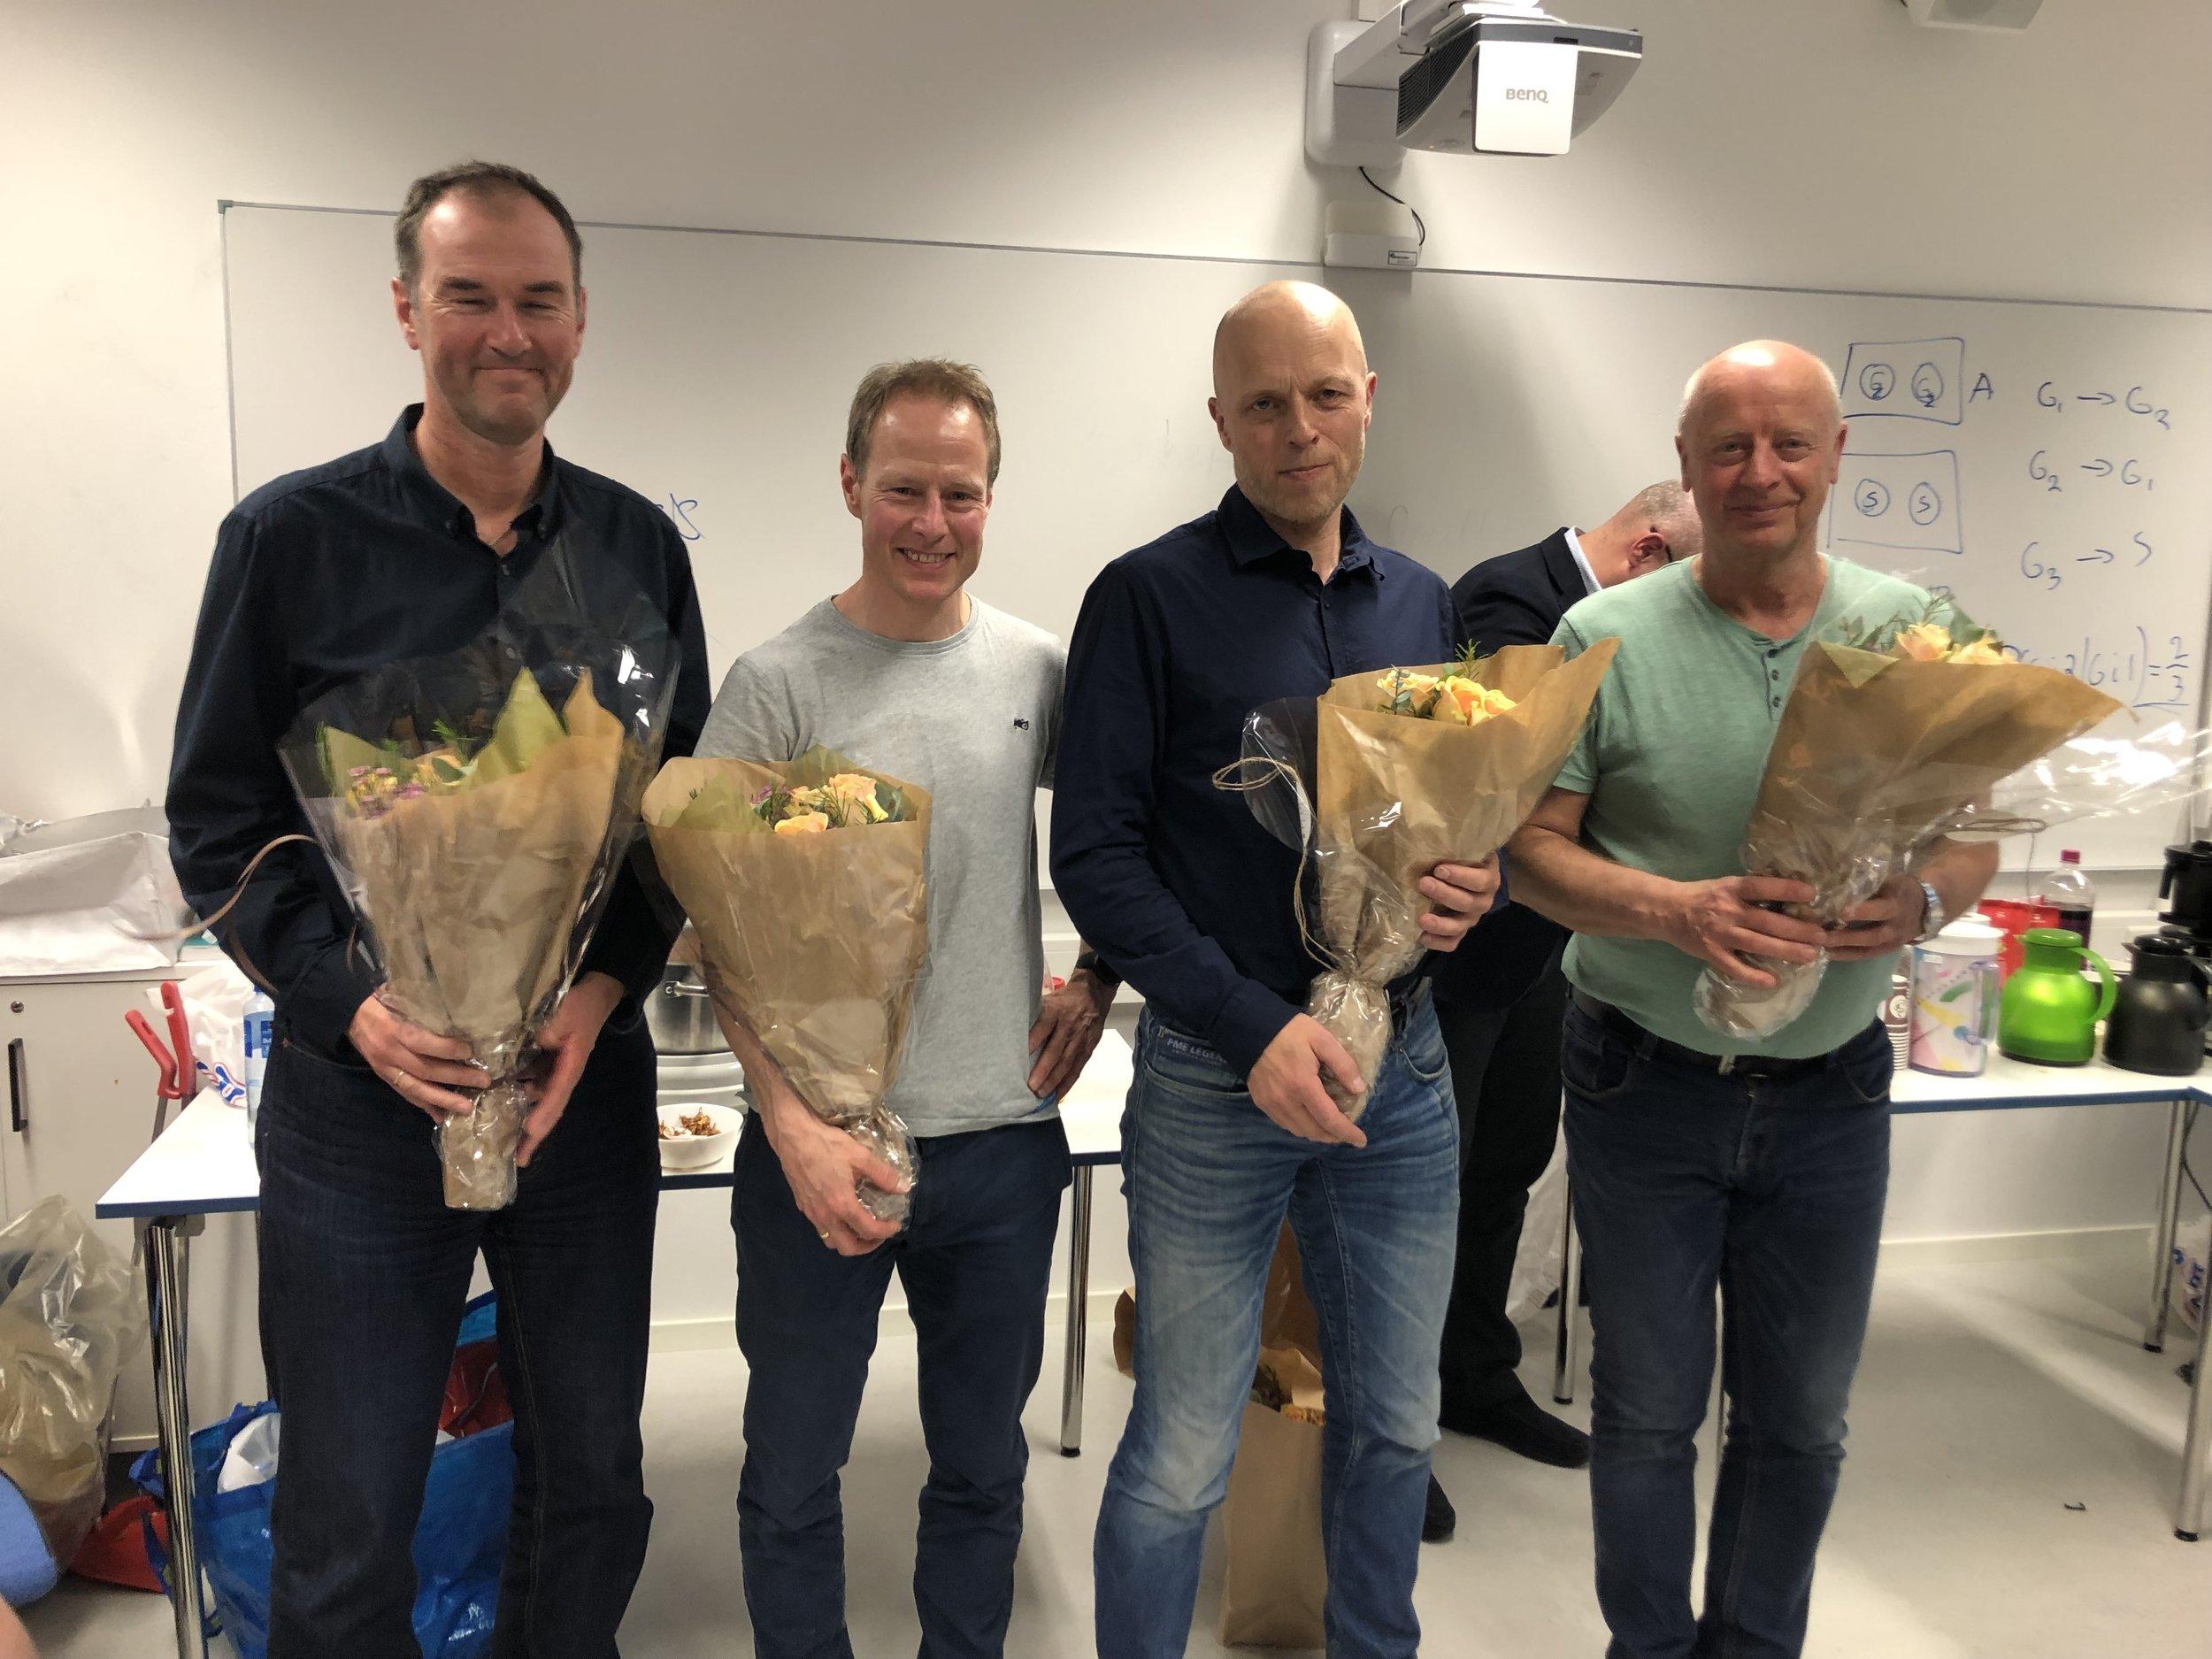 Fornøyde trenere med blomsterbuketter: Carl Erk Sando, Petter Andersen, Ivar Njøs og Amund Sjøbrend.